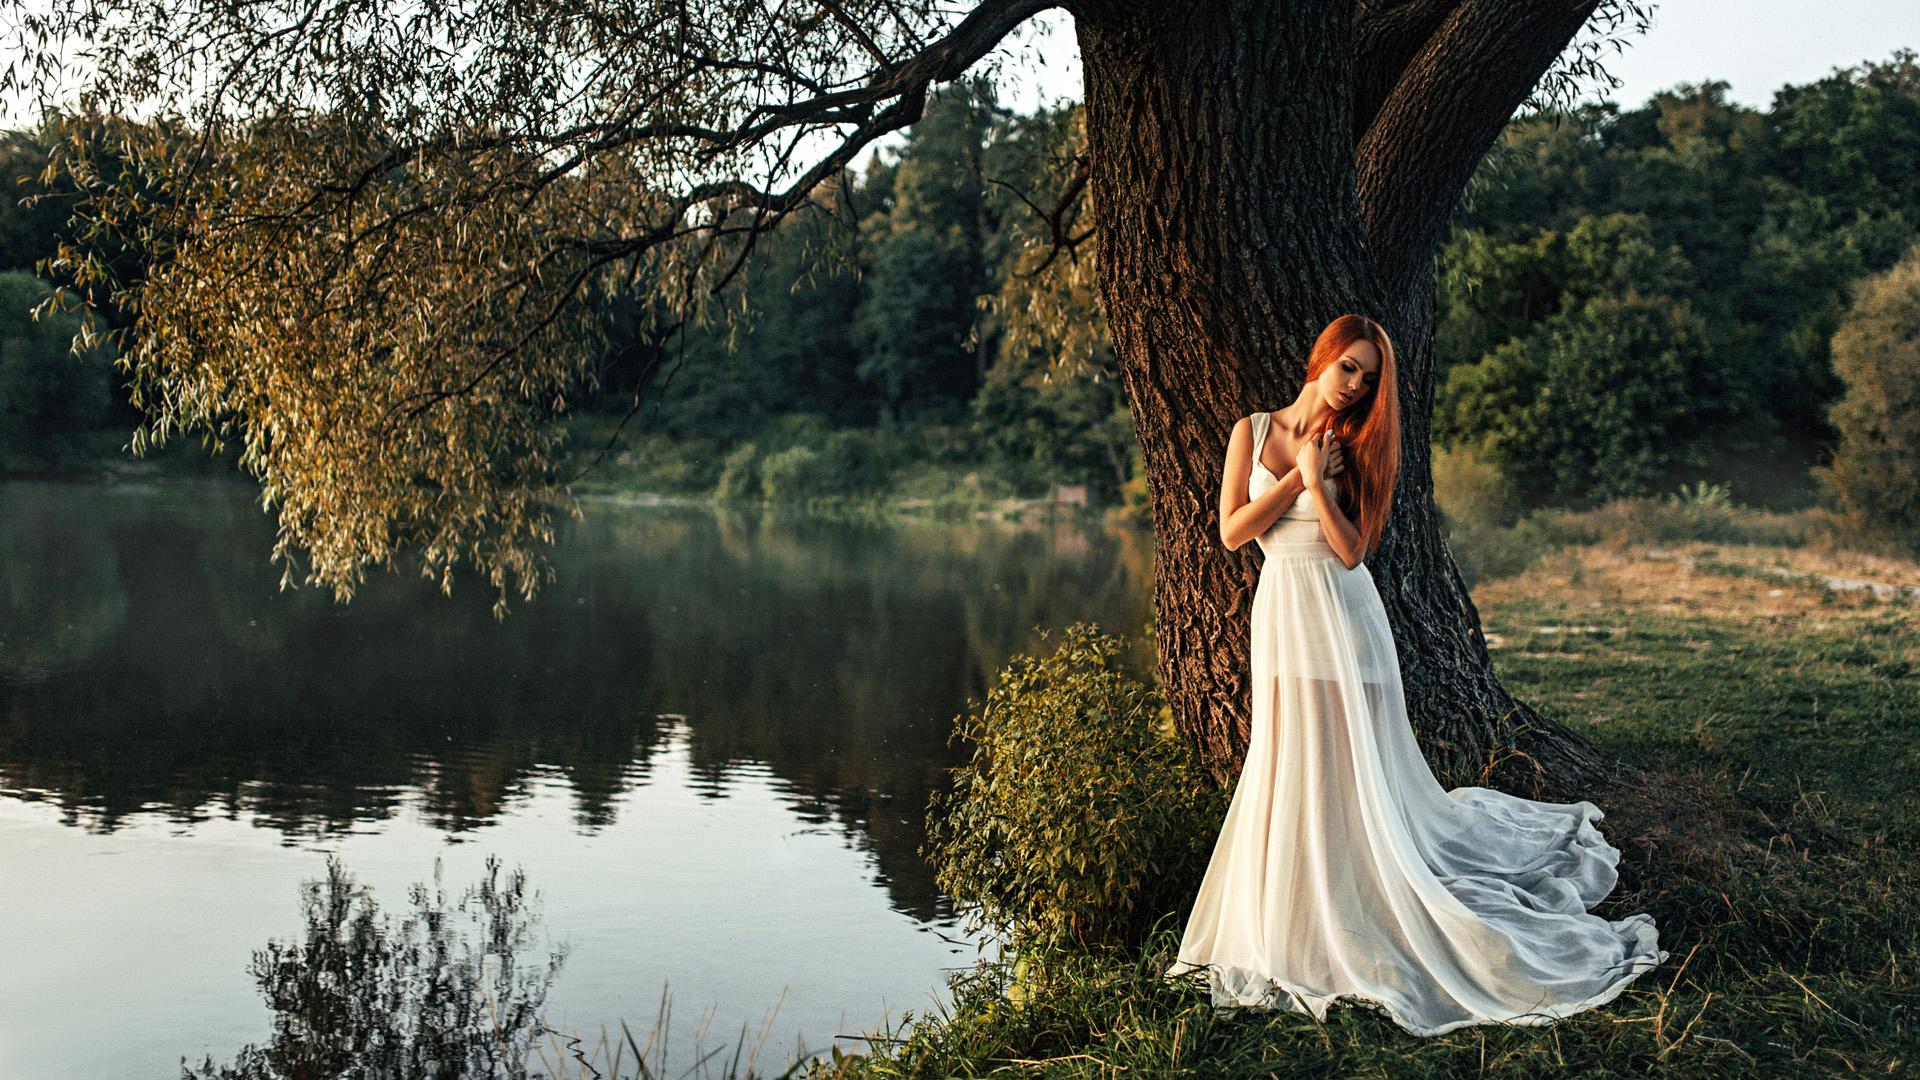 Girl Standing Alone Near Tree, Hd Girls, 4K Wallpapers -3960